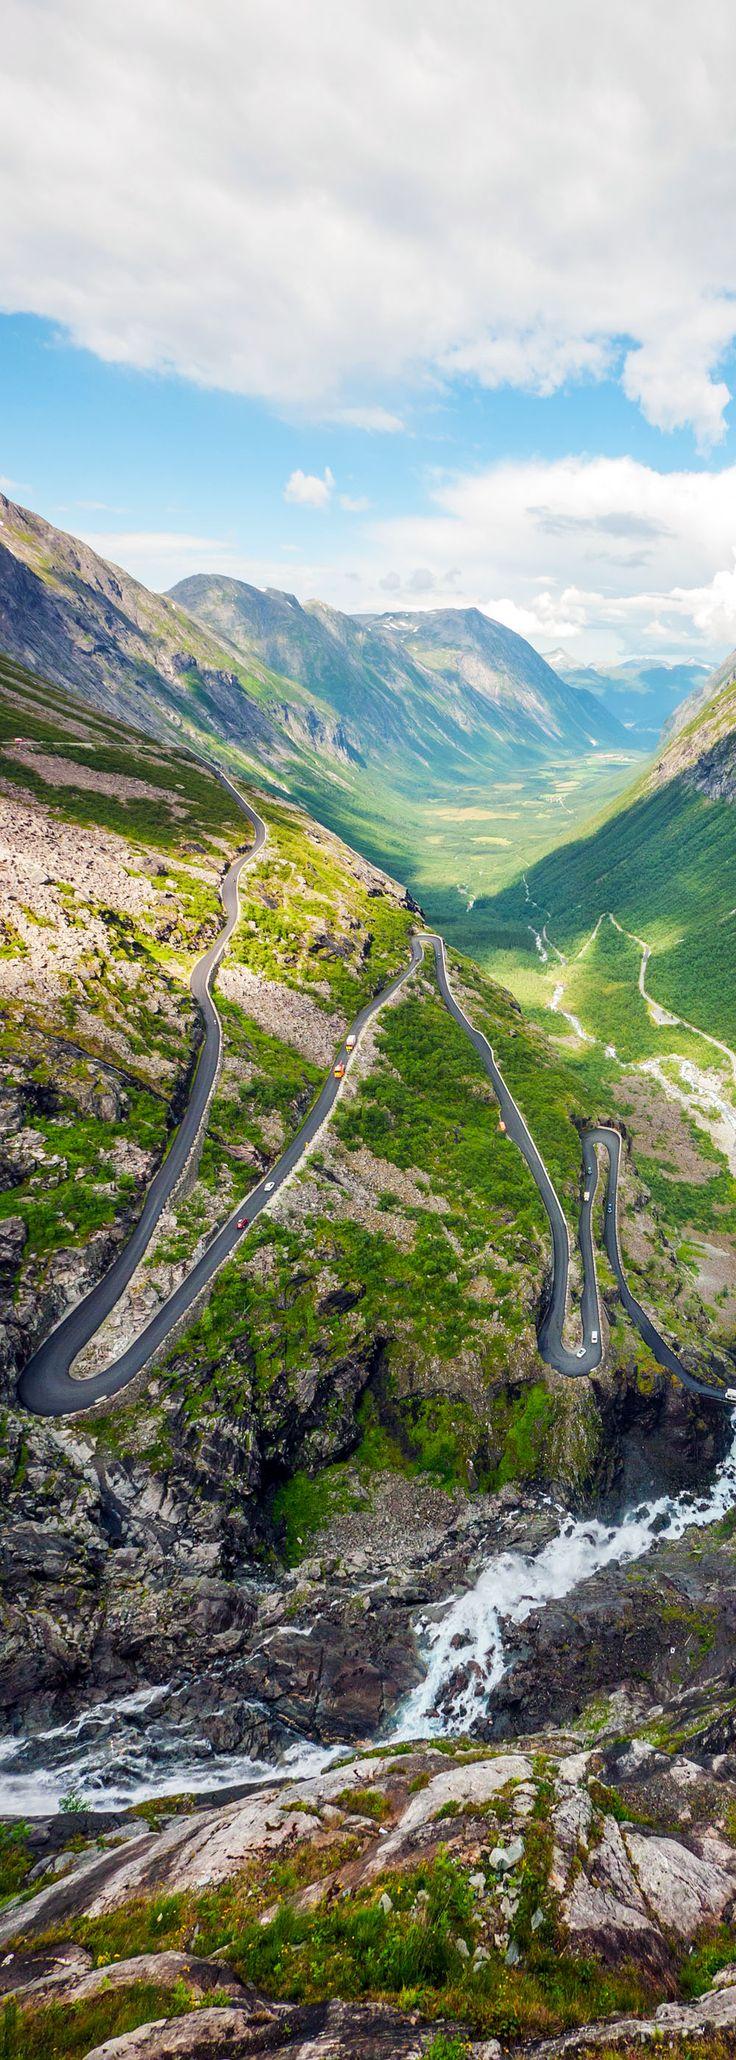 Trollstigen Serpentine Mountain Road and Stigfossen Waterfall